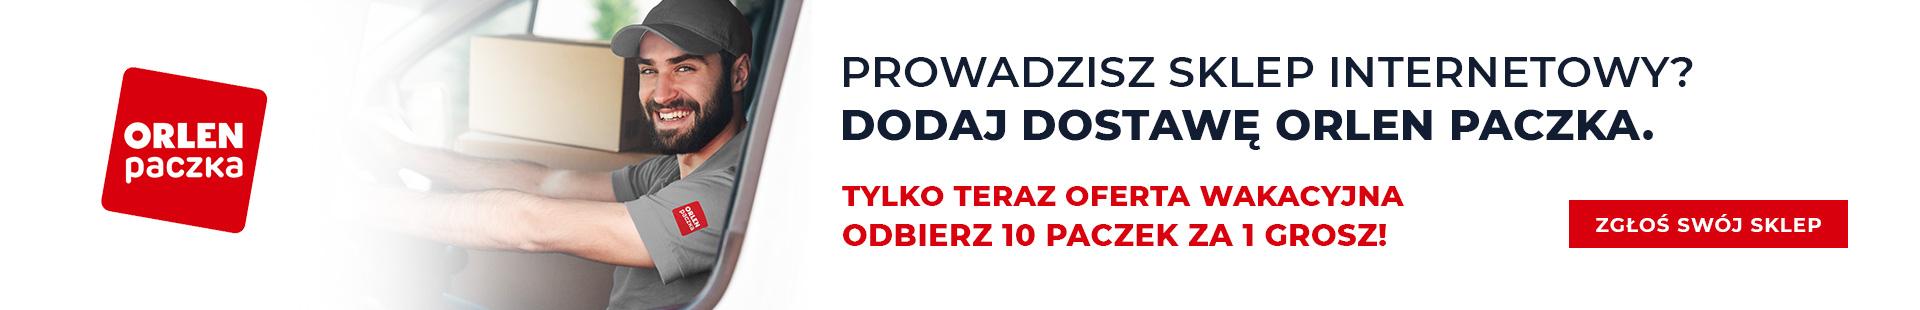 Orlen Paczka LP